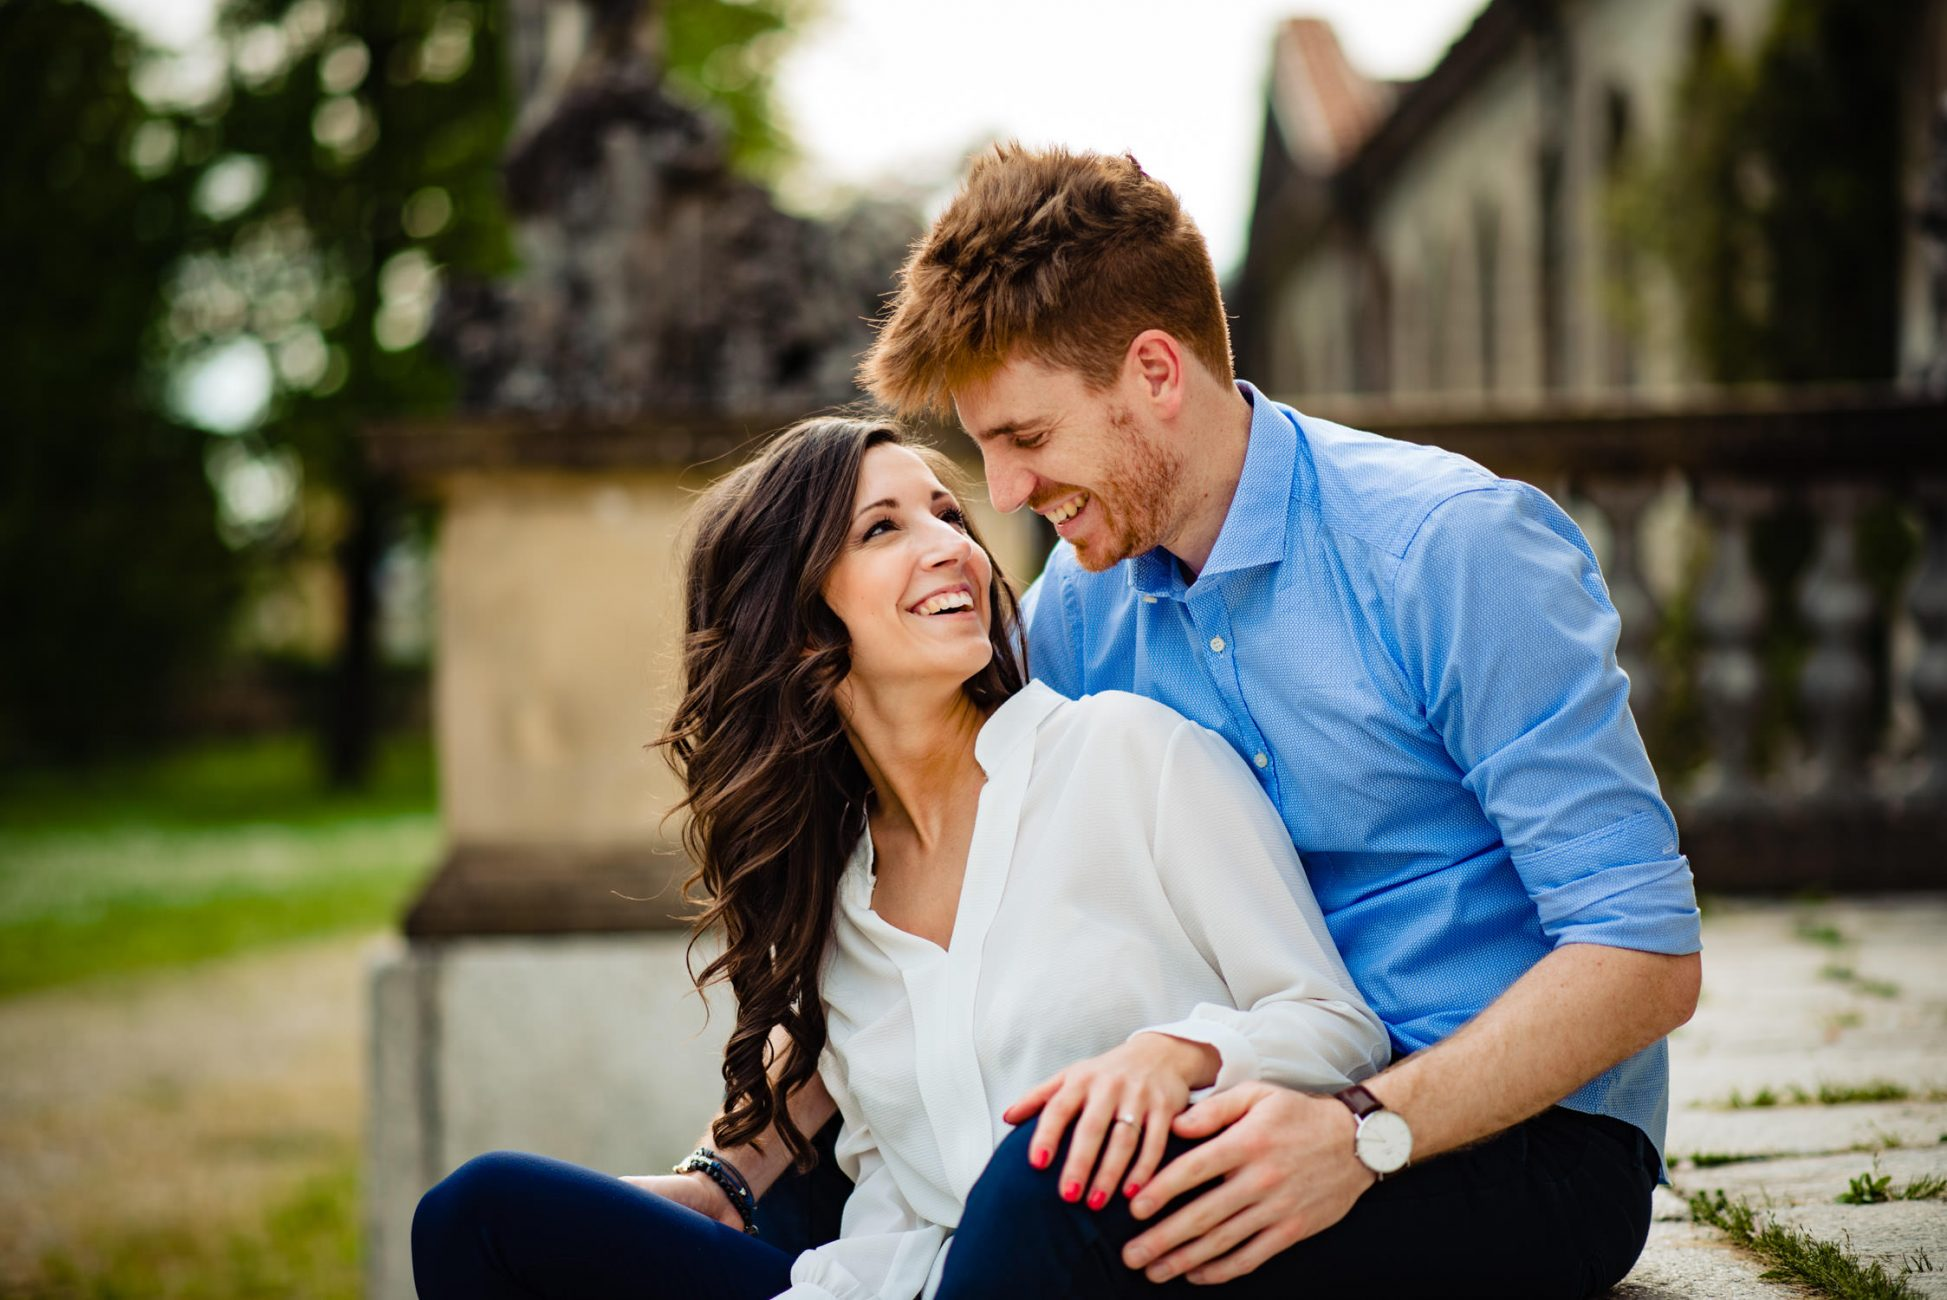 fotografo matrimonio engagement varese milano como artistico spontaneo elegante intimo creativo lamperti